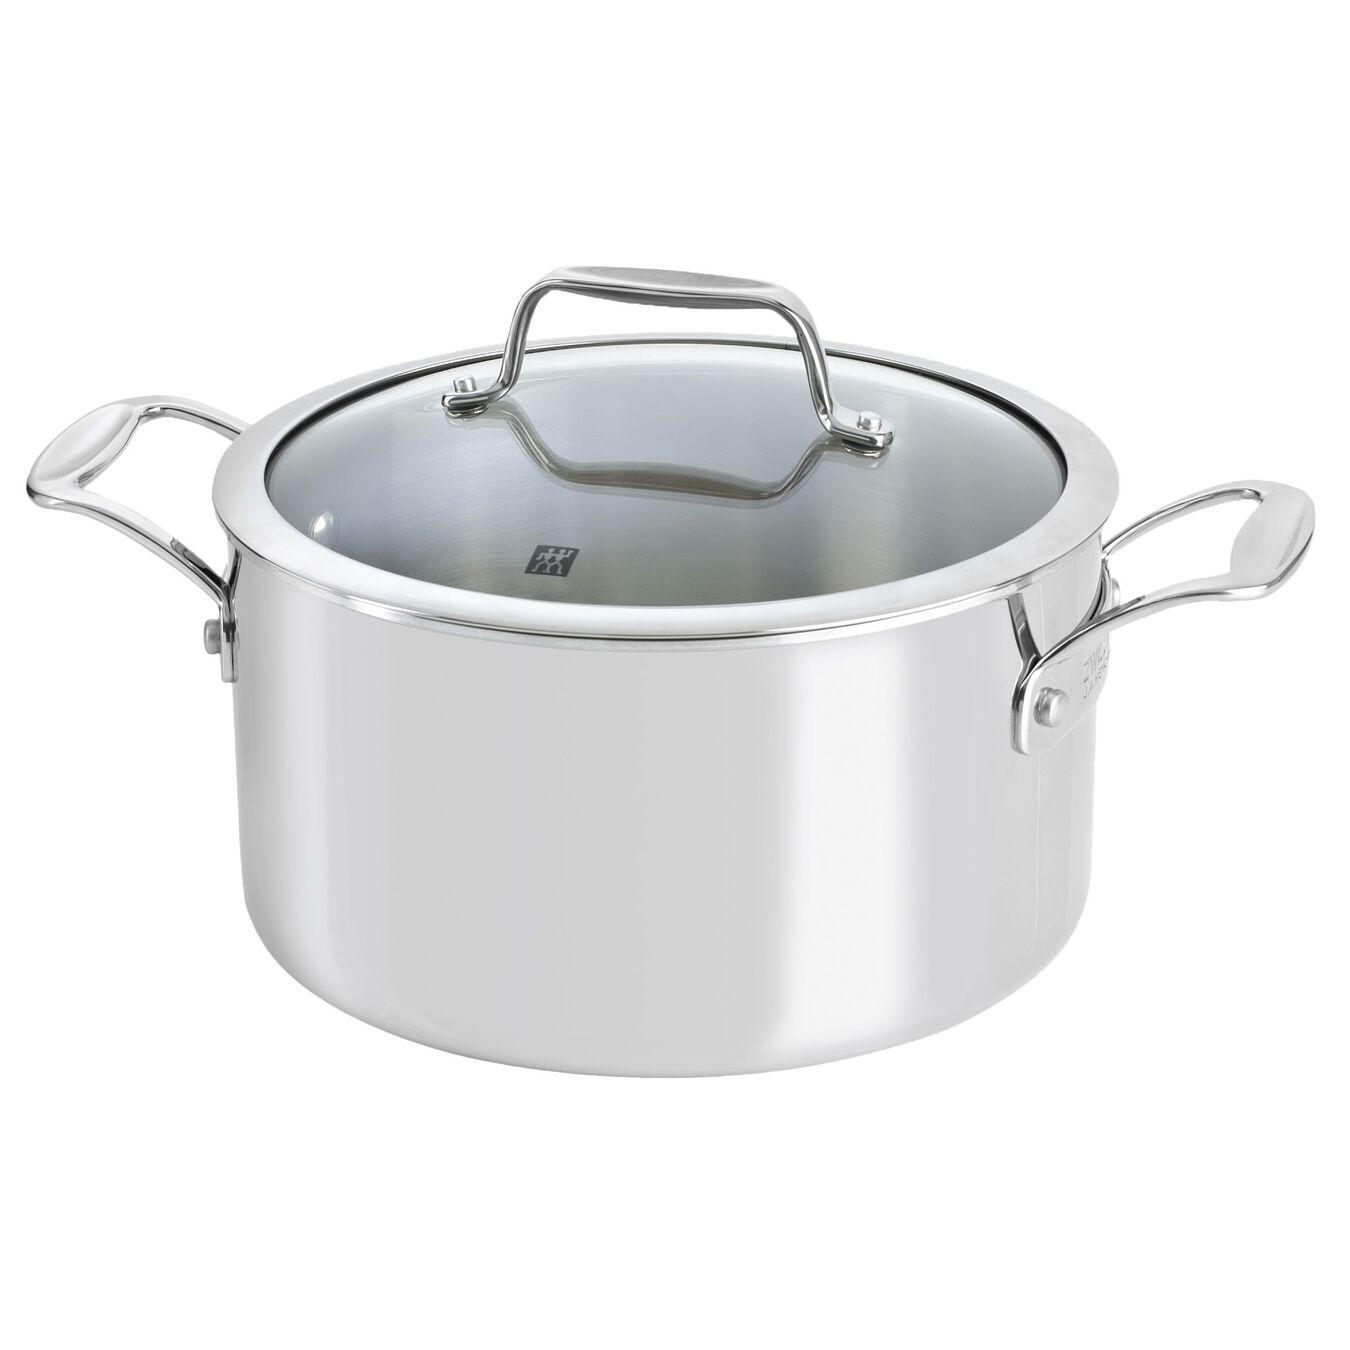 10 Piece cookware set with bonus non-stick frypan,,large 5